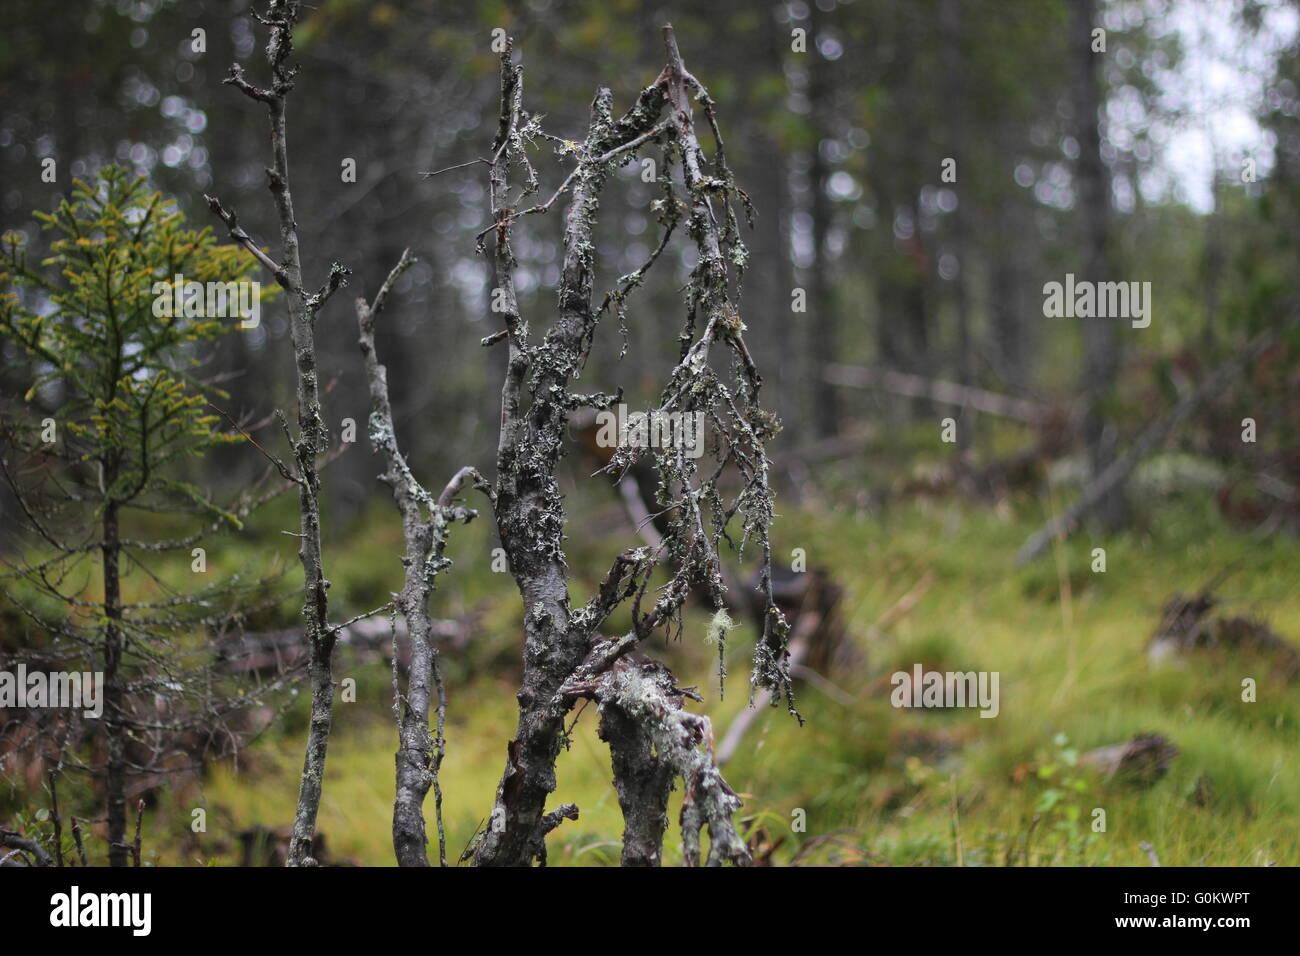 Dead plants in a Swedish bog in Värmland. - Stock Image